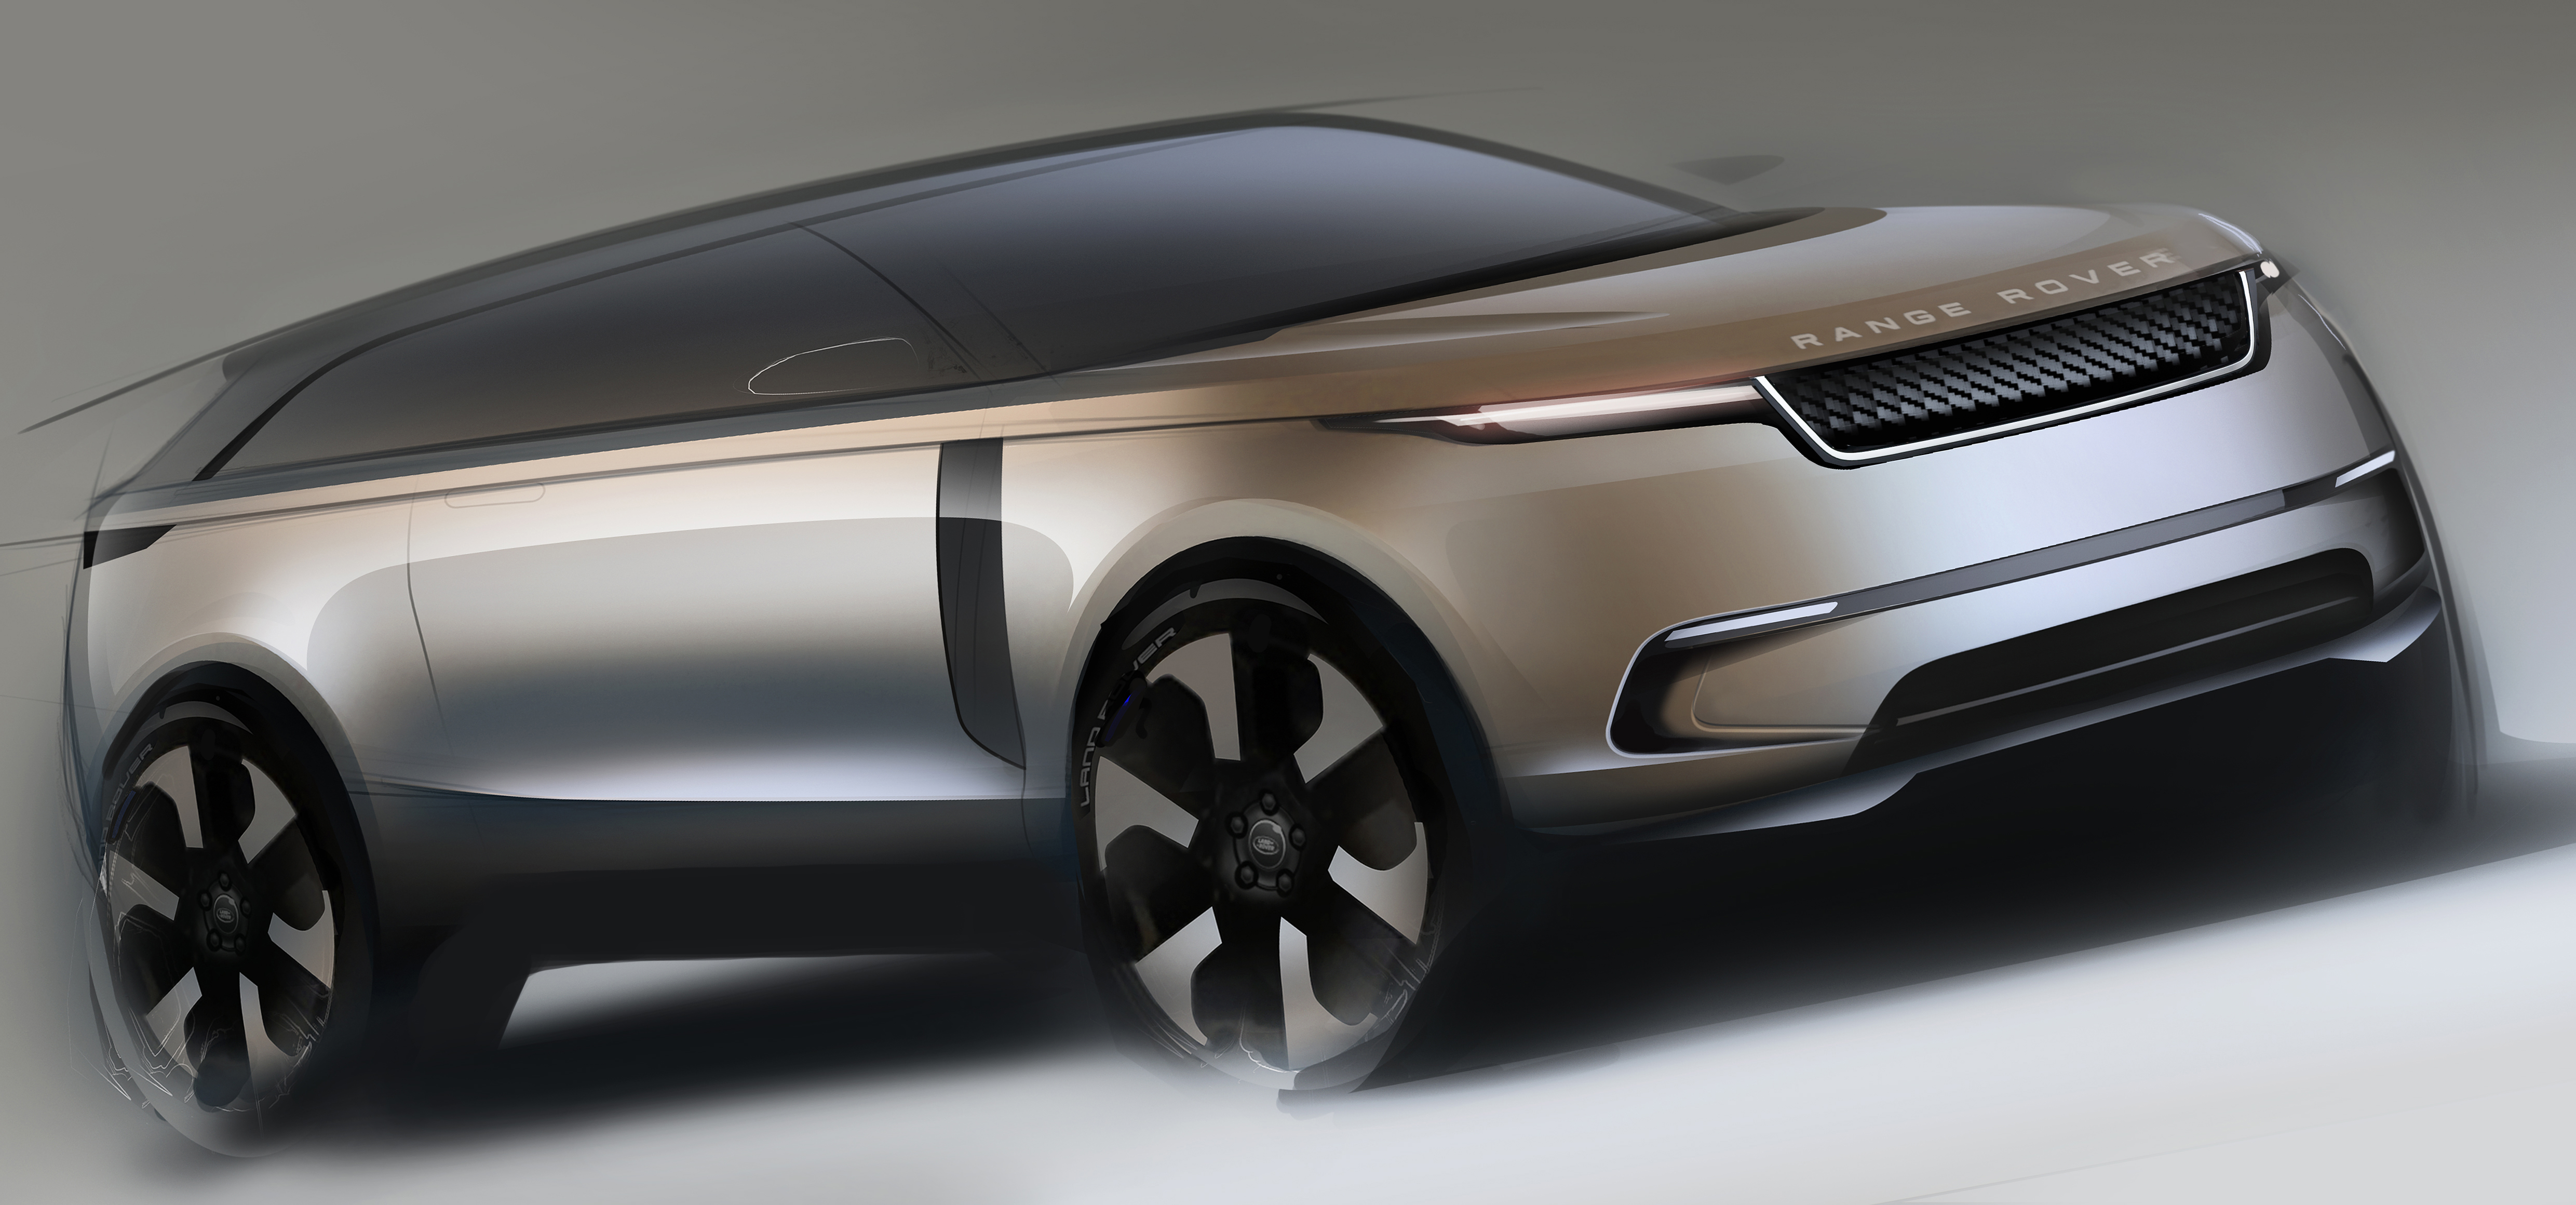 Sketch Range Rover Velar